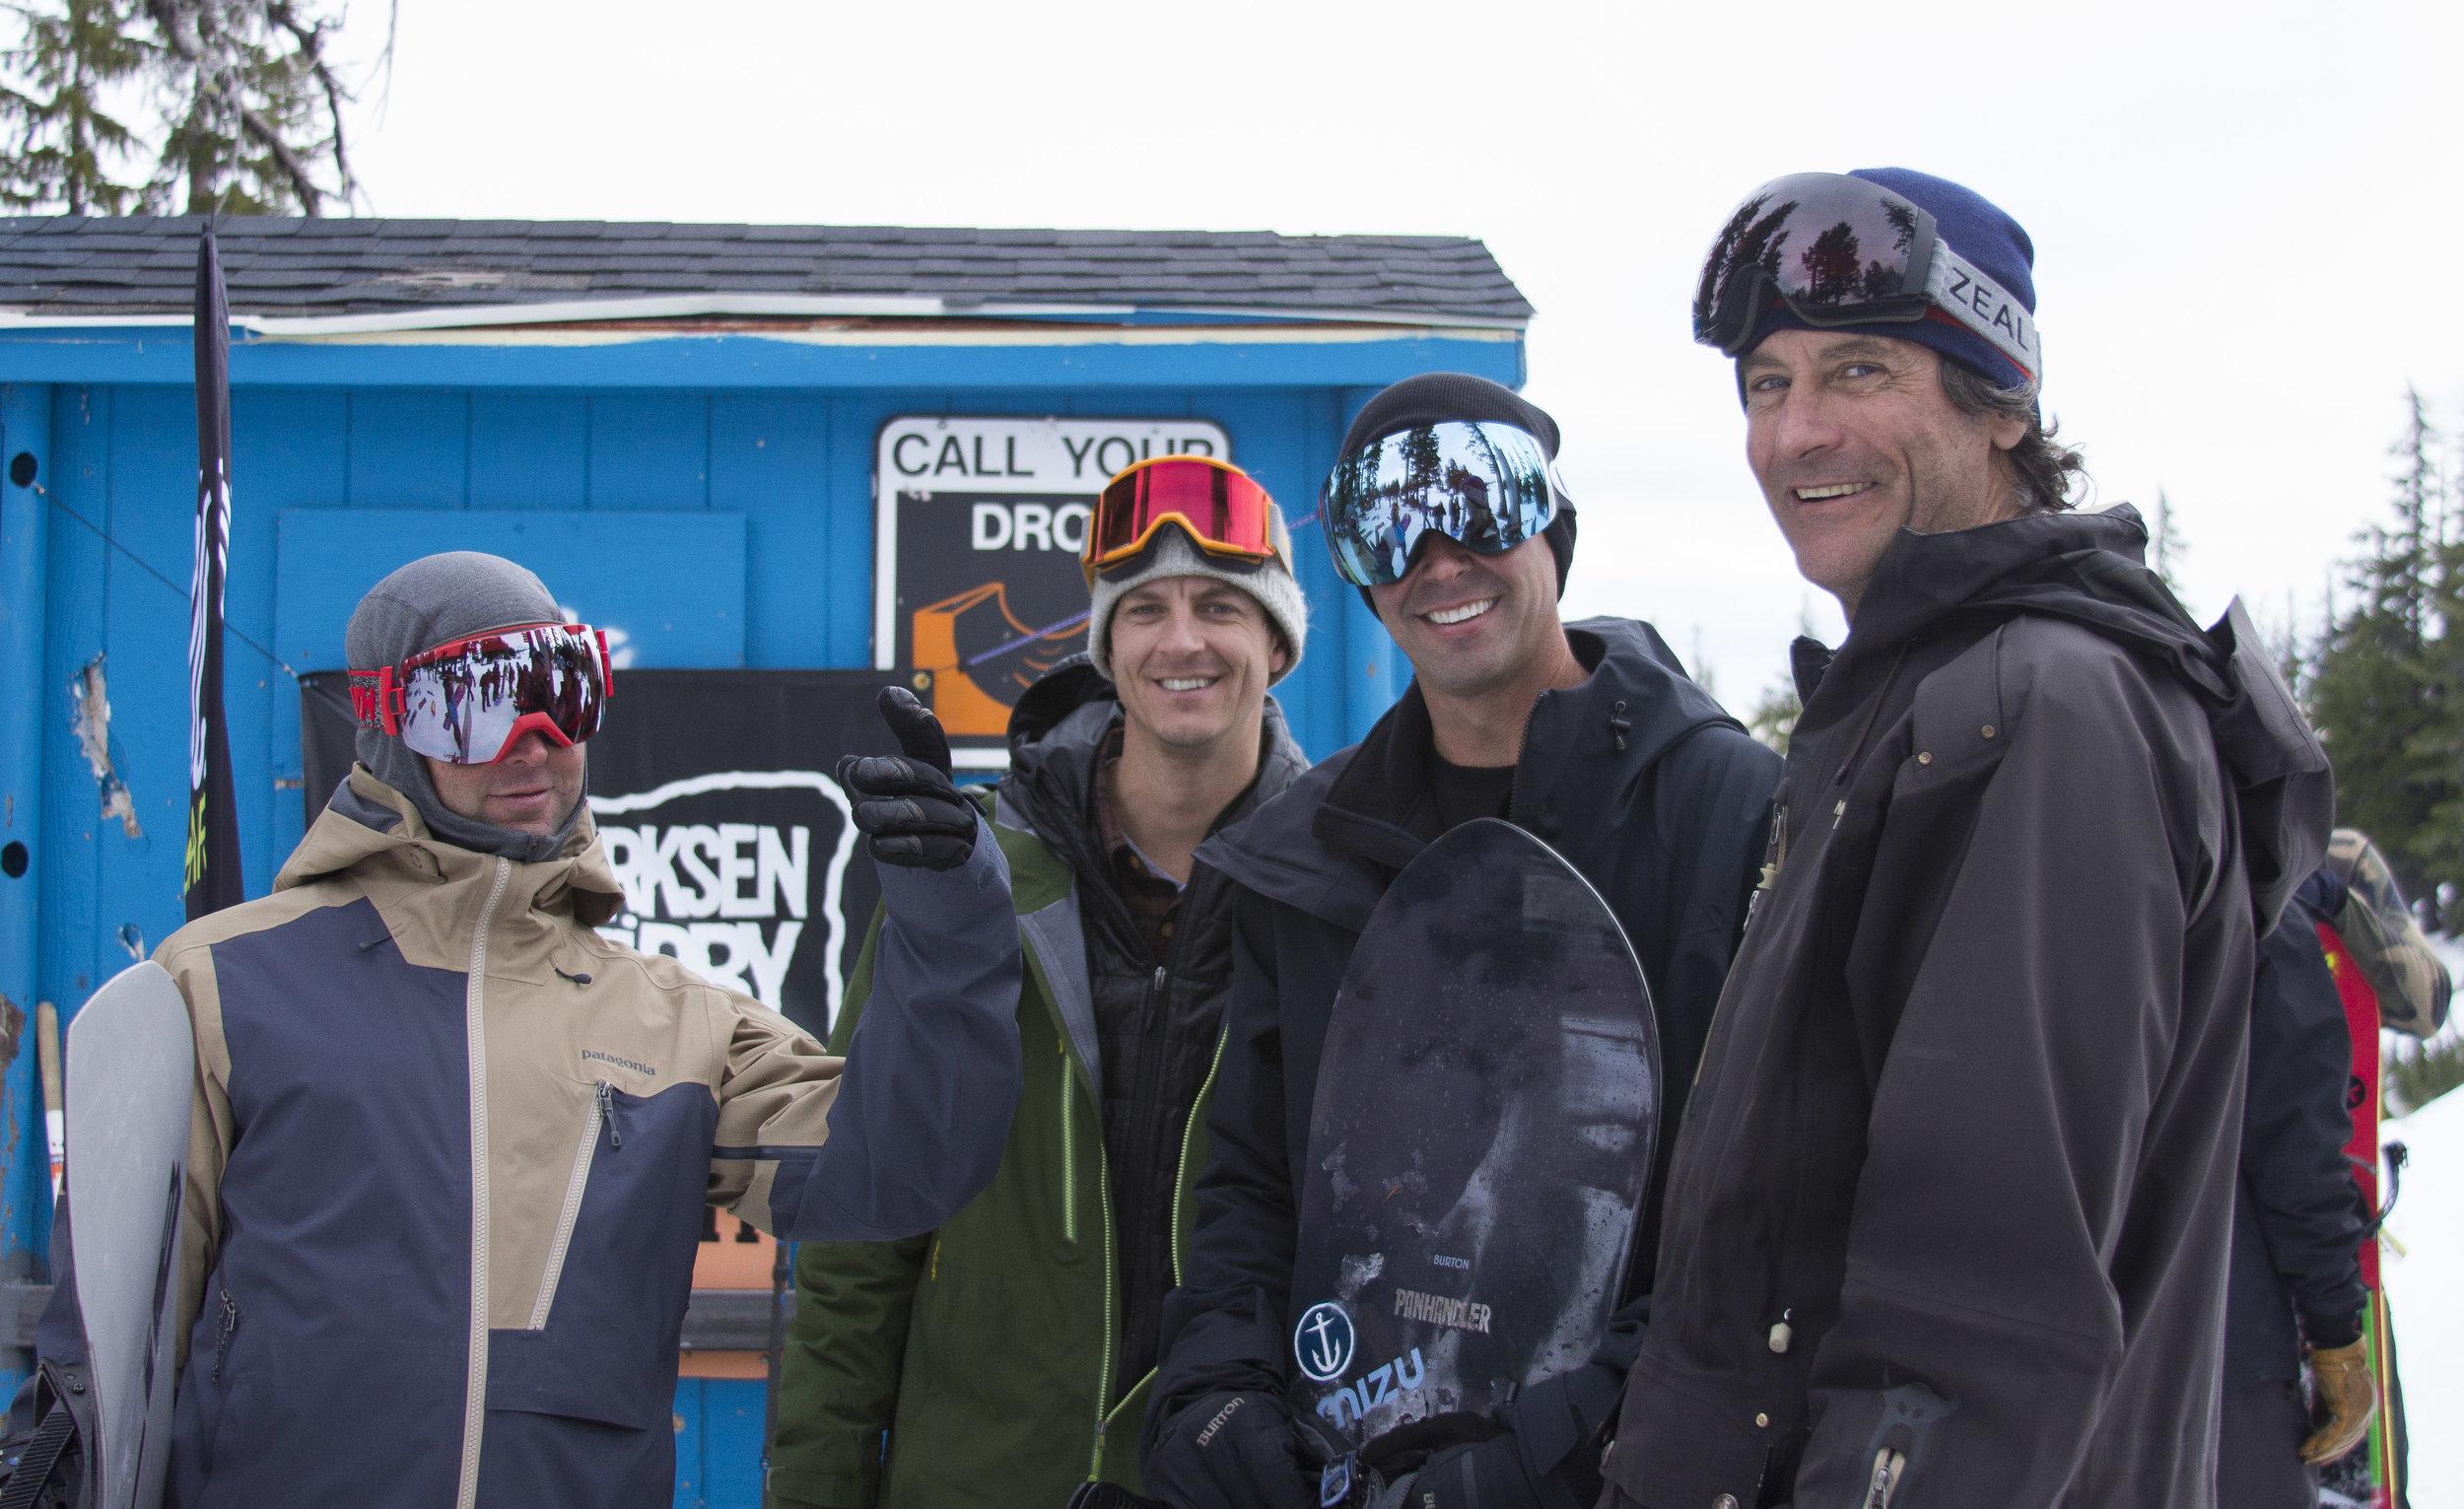 Jason McAllister, Tom Burt & crew, photo by Lori LaBissoniere